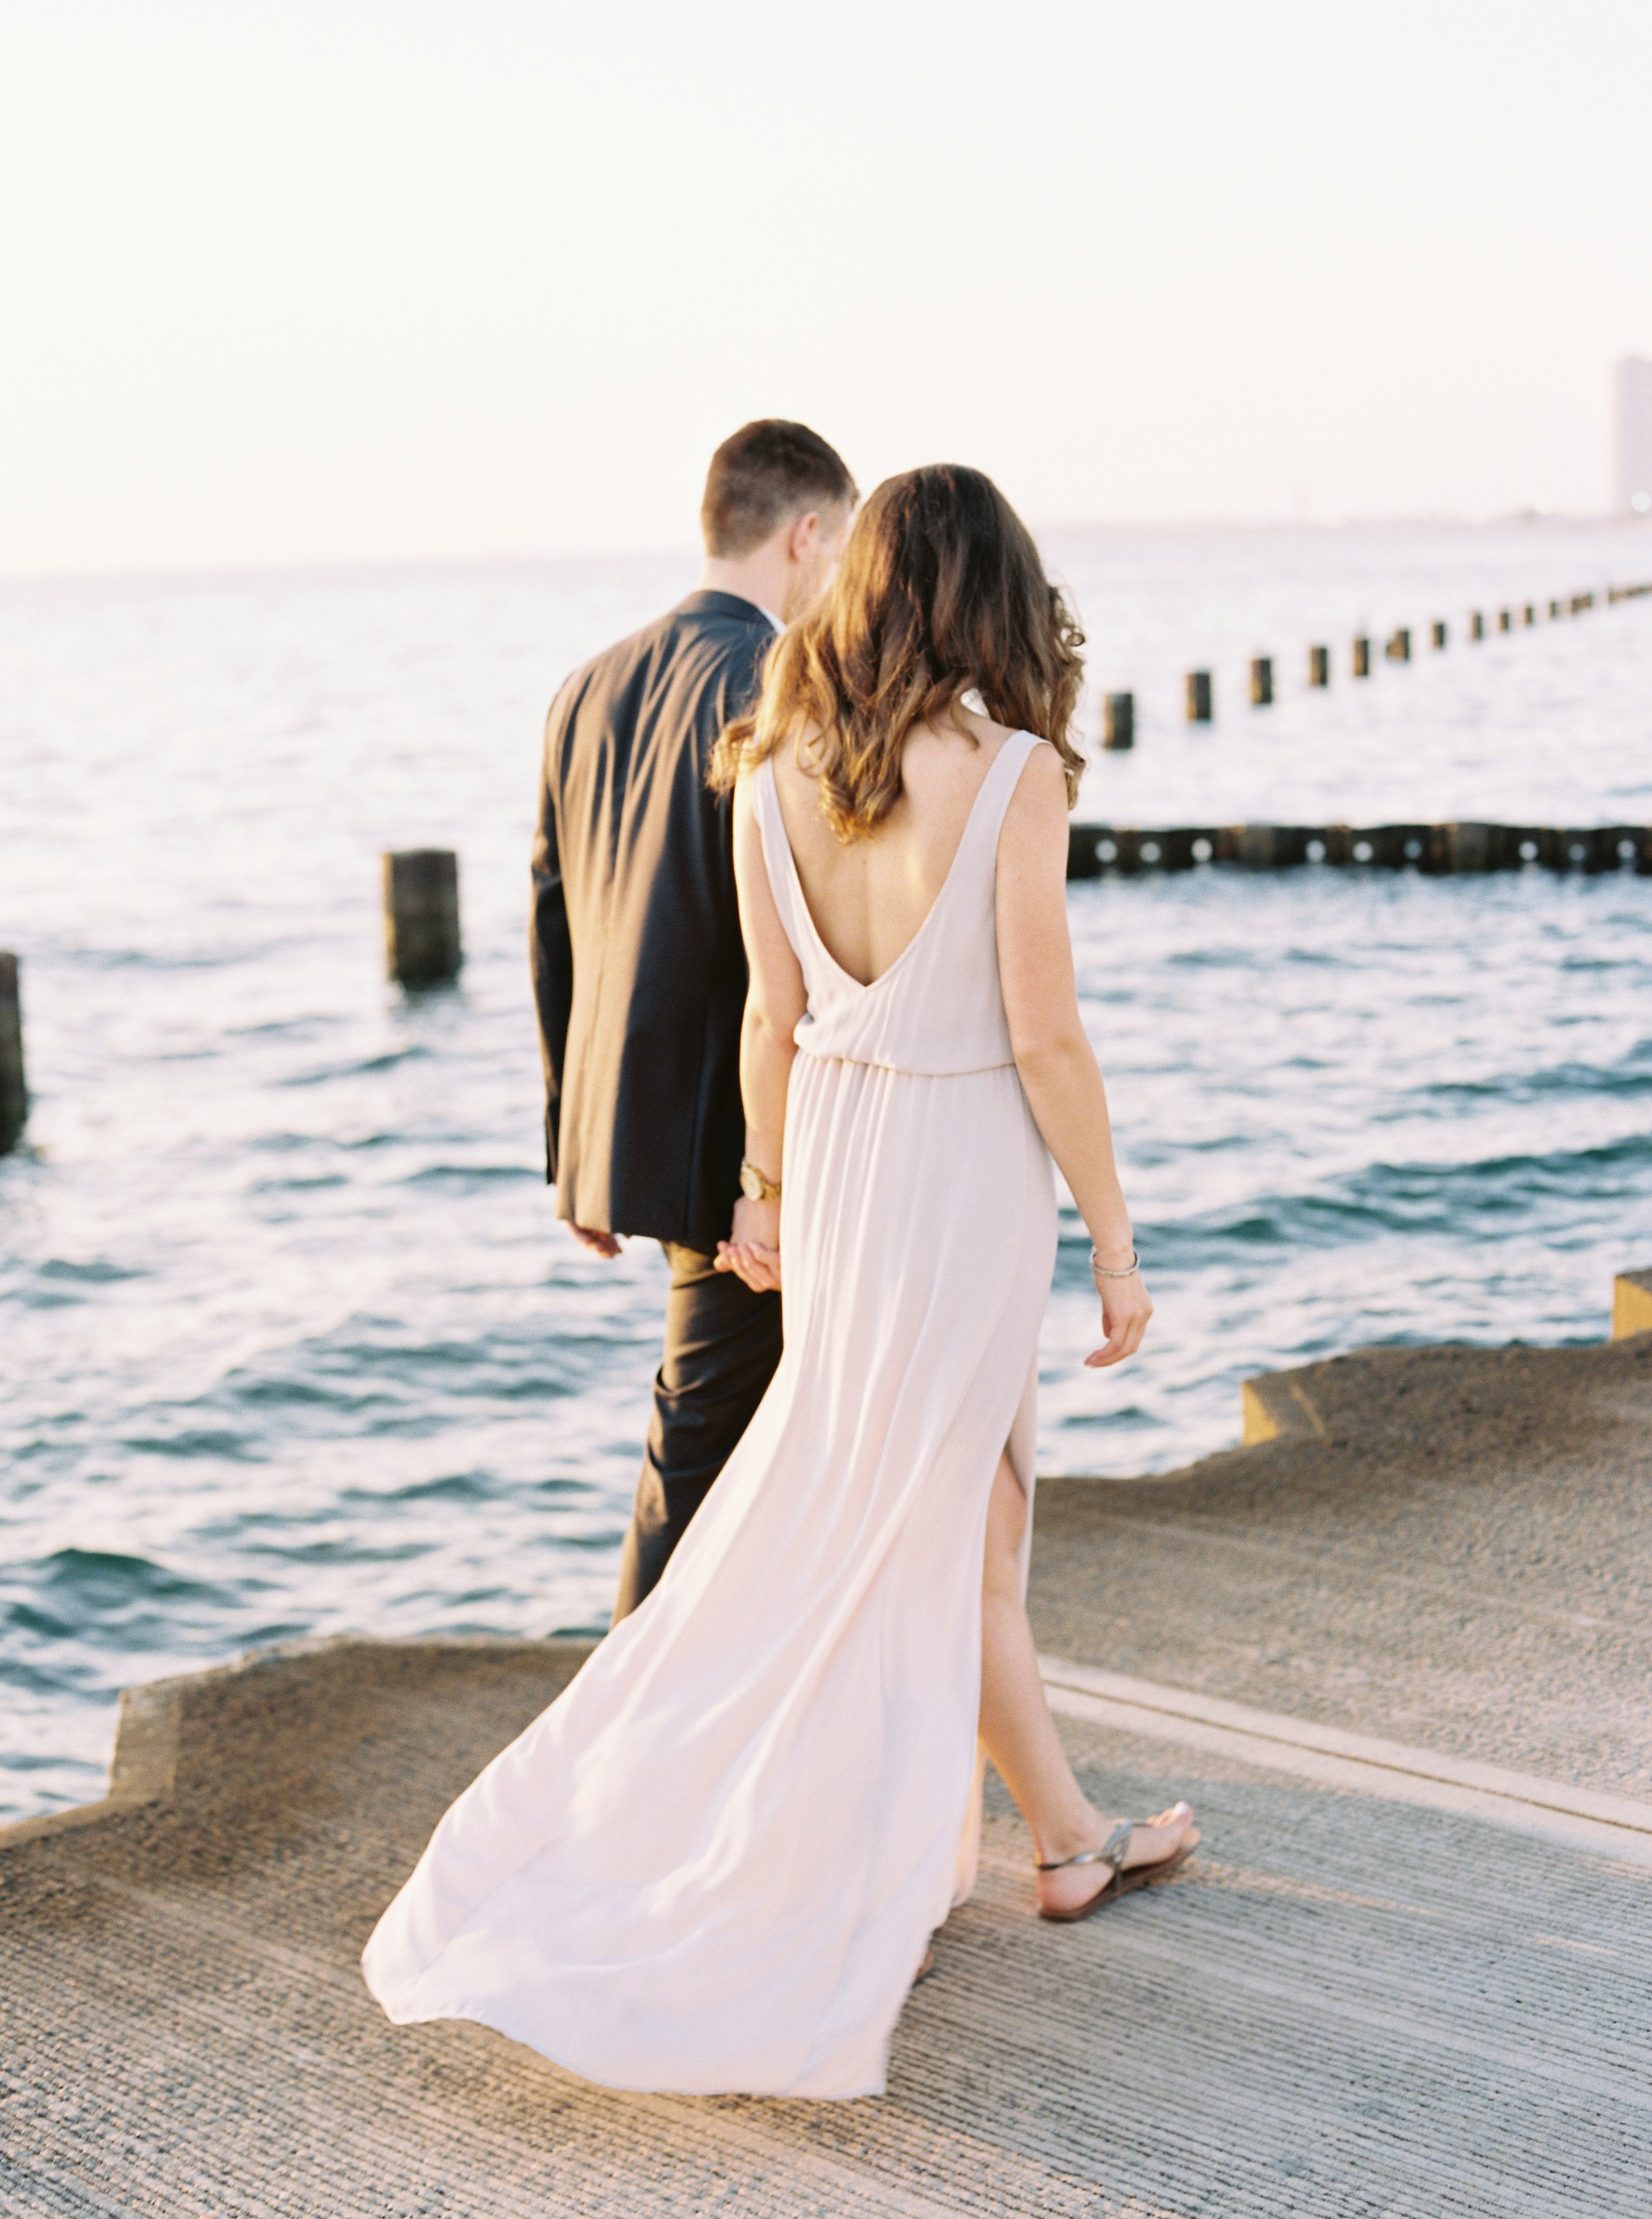 Kyle John l Fine Art Wedding Photography l Chicago, Copenhagen, California, New York, Destination l Blog l Nathalie and Colby_Lake Michigan_Sunrise Engagement_10